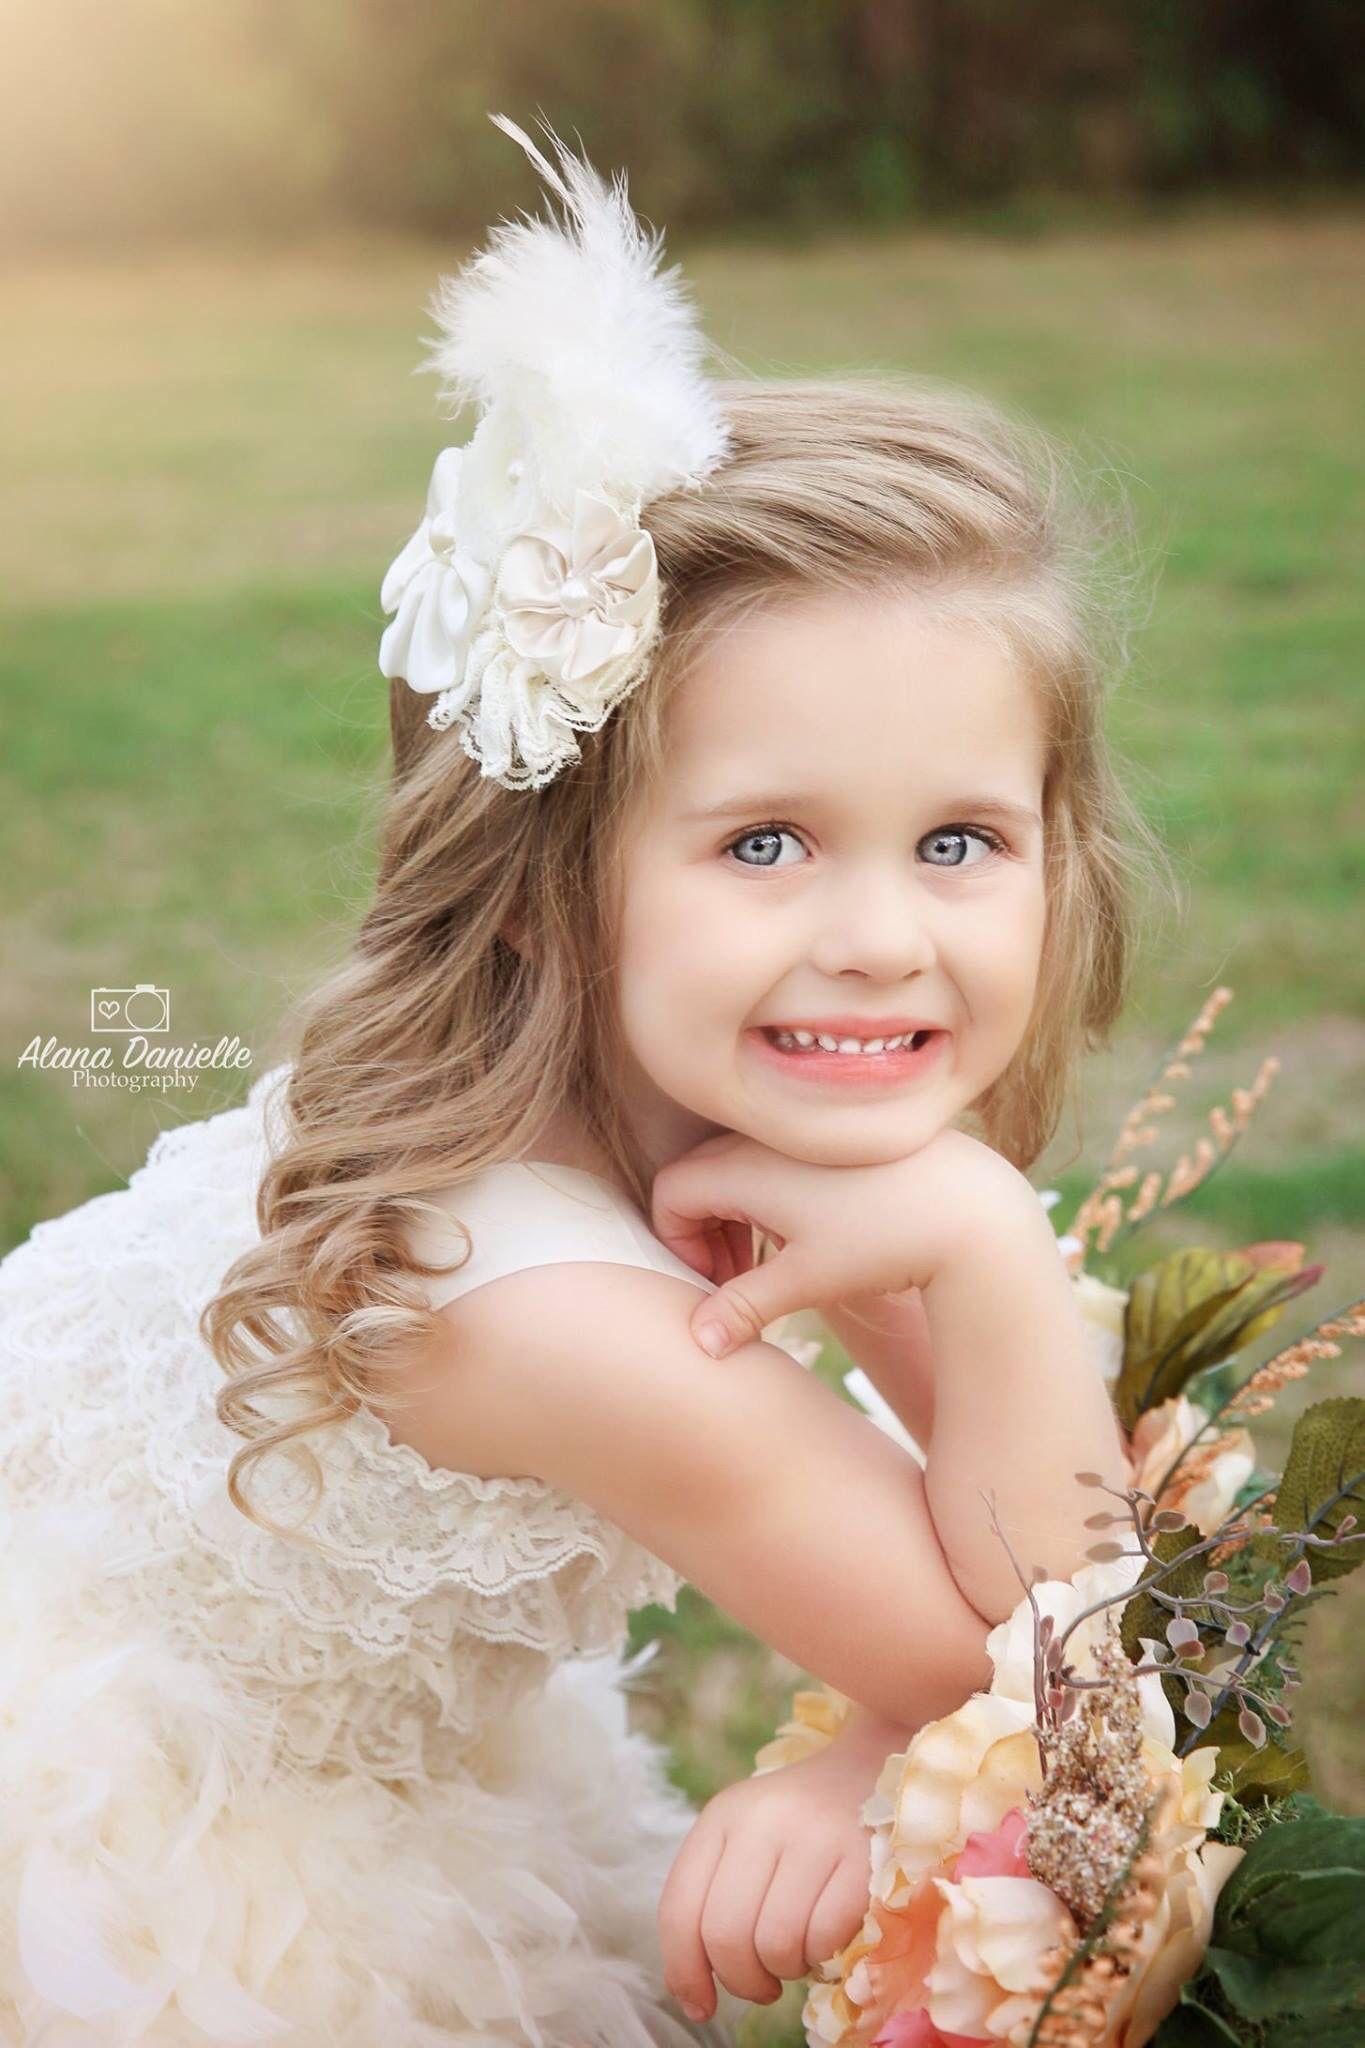 Girl photo shoot | Girl photo shoots, Little girl photography, Children  photography